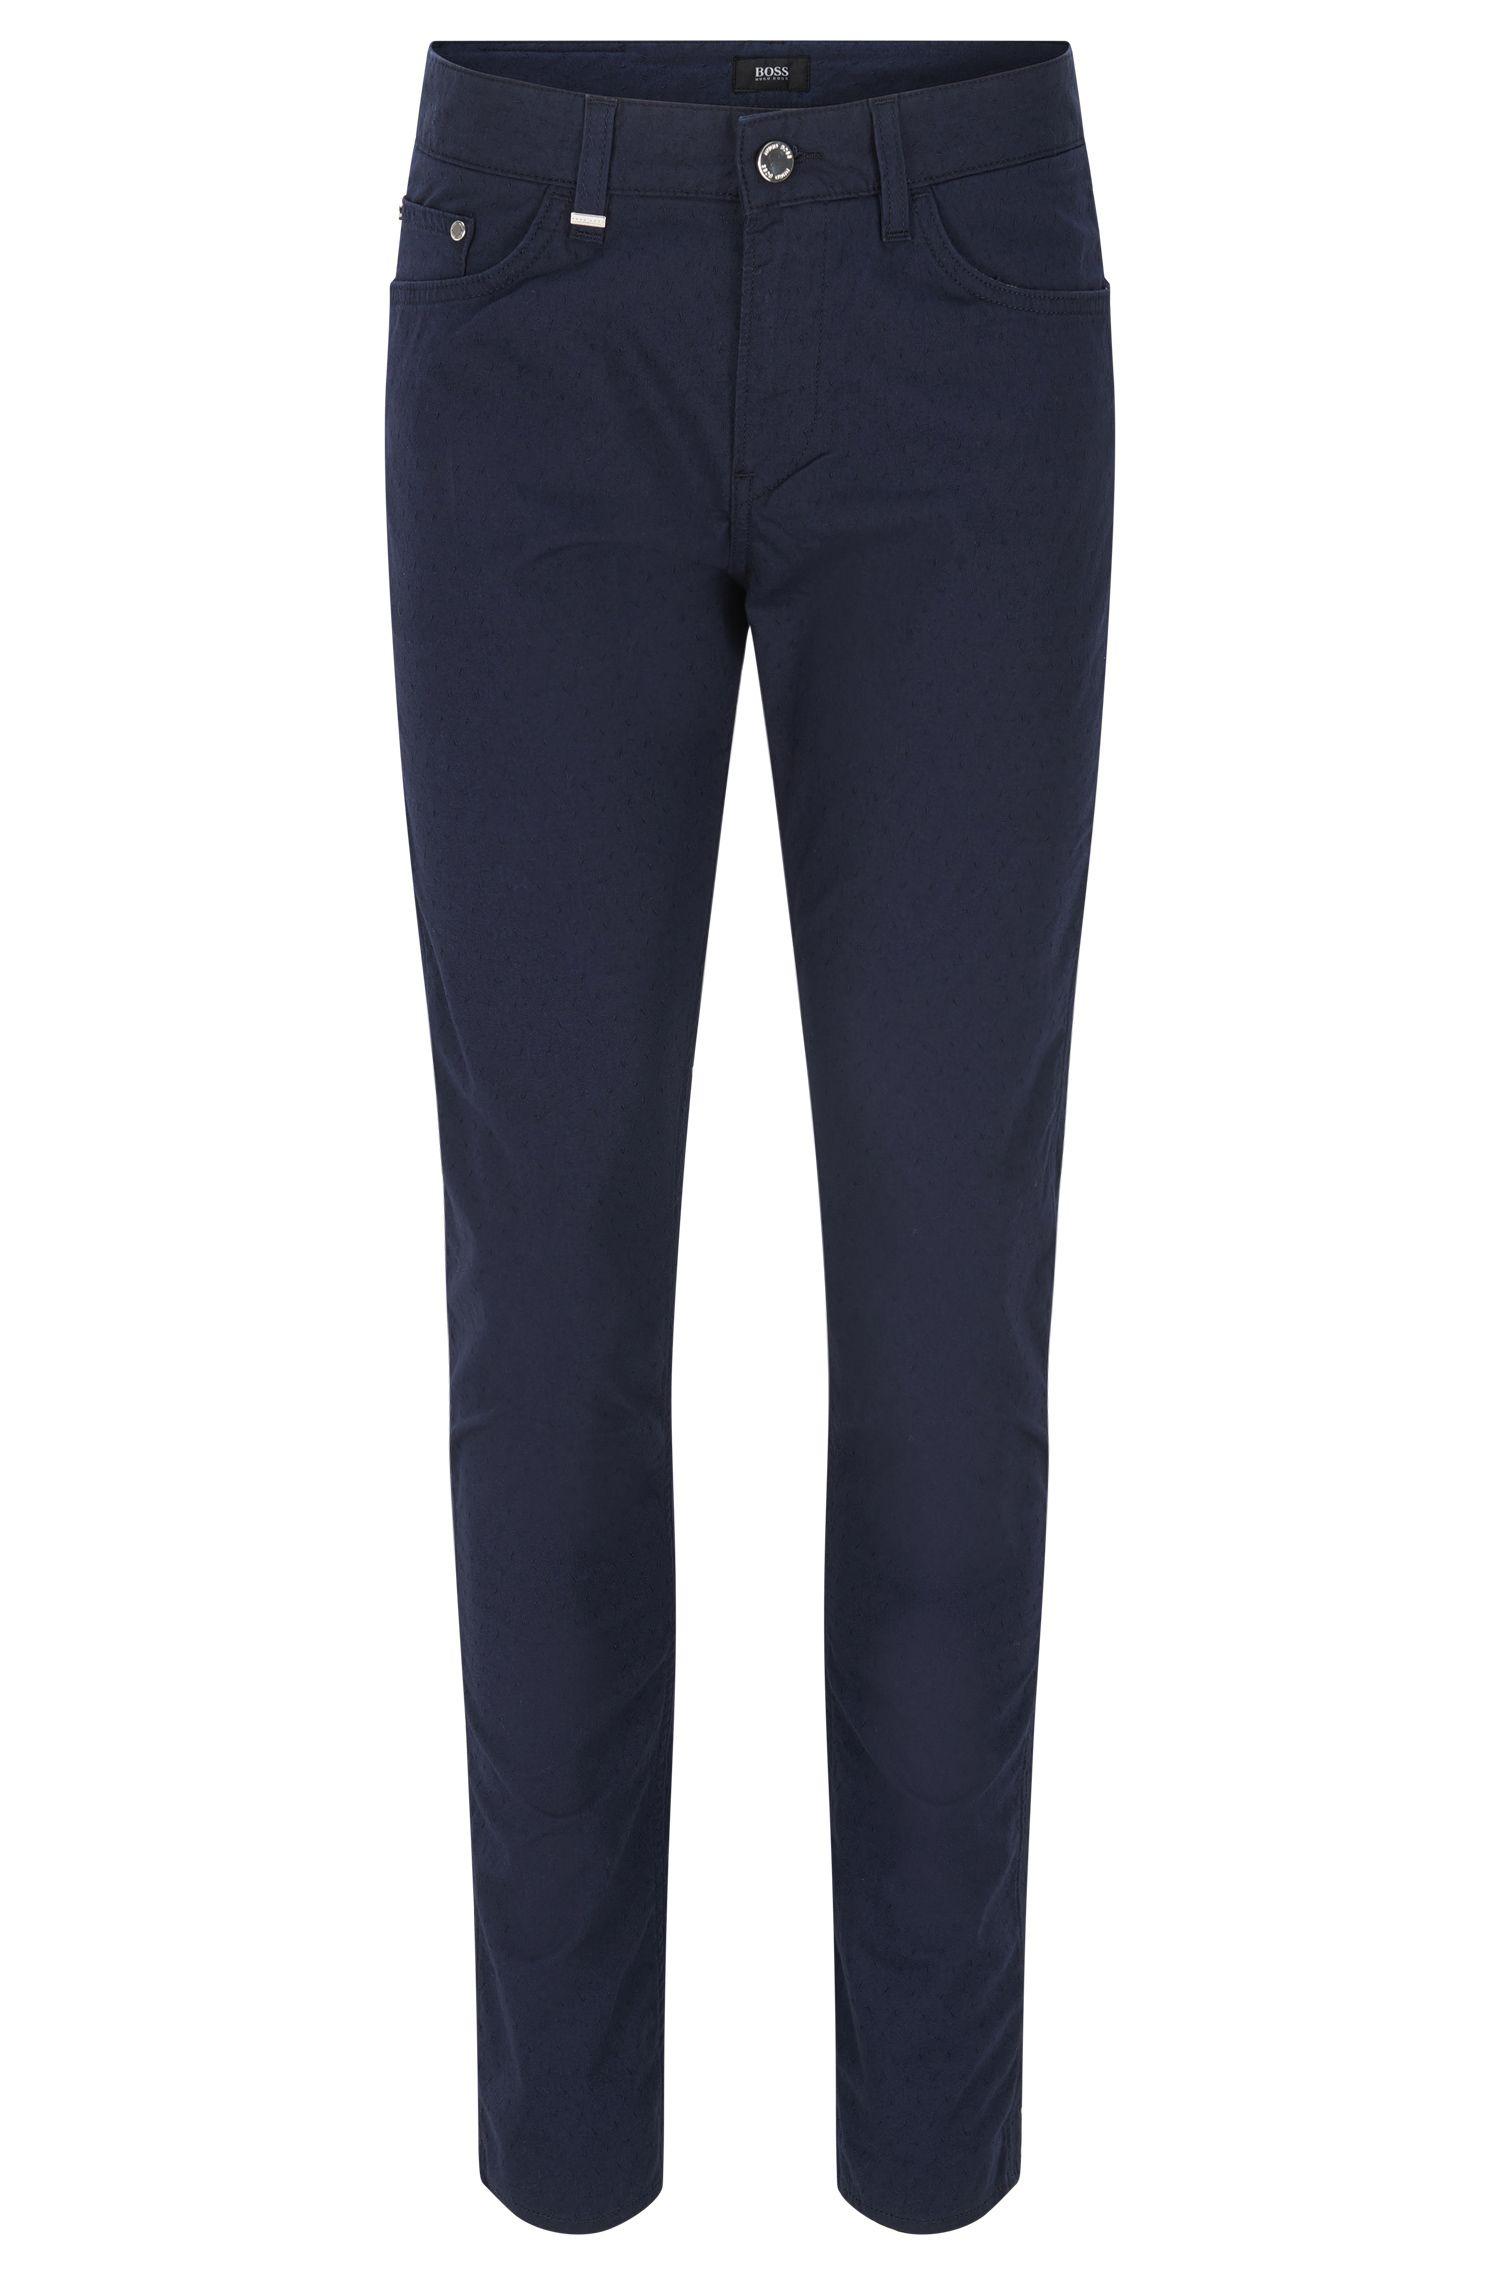 Jeans Slim Fit en denim micro jacquard